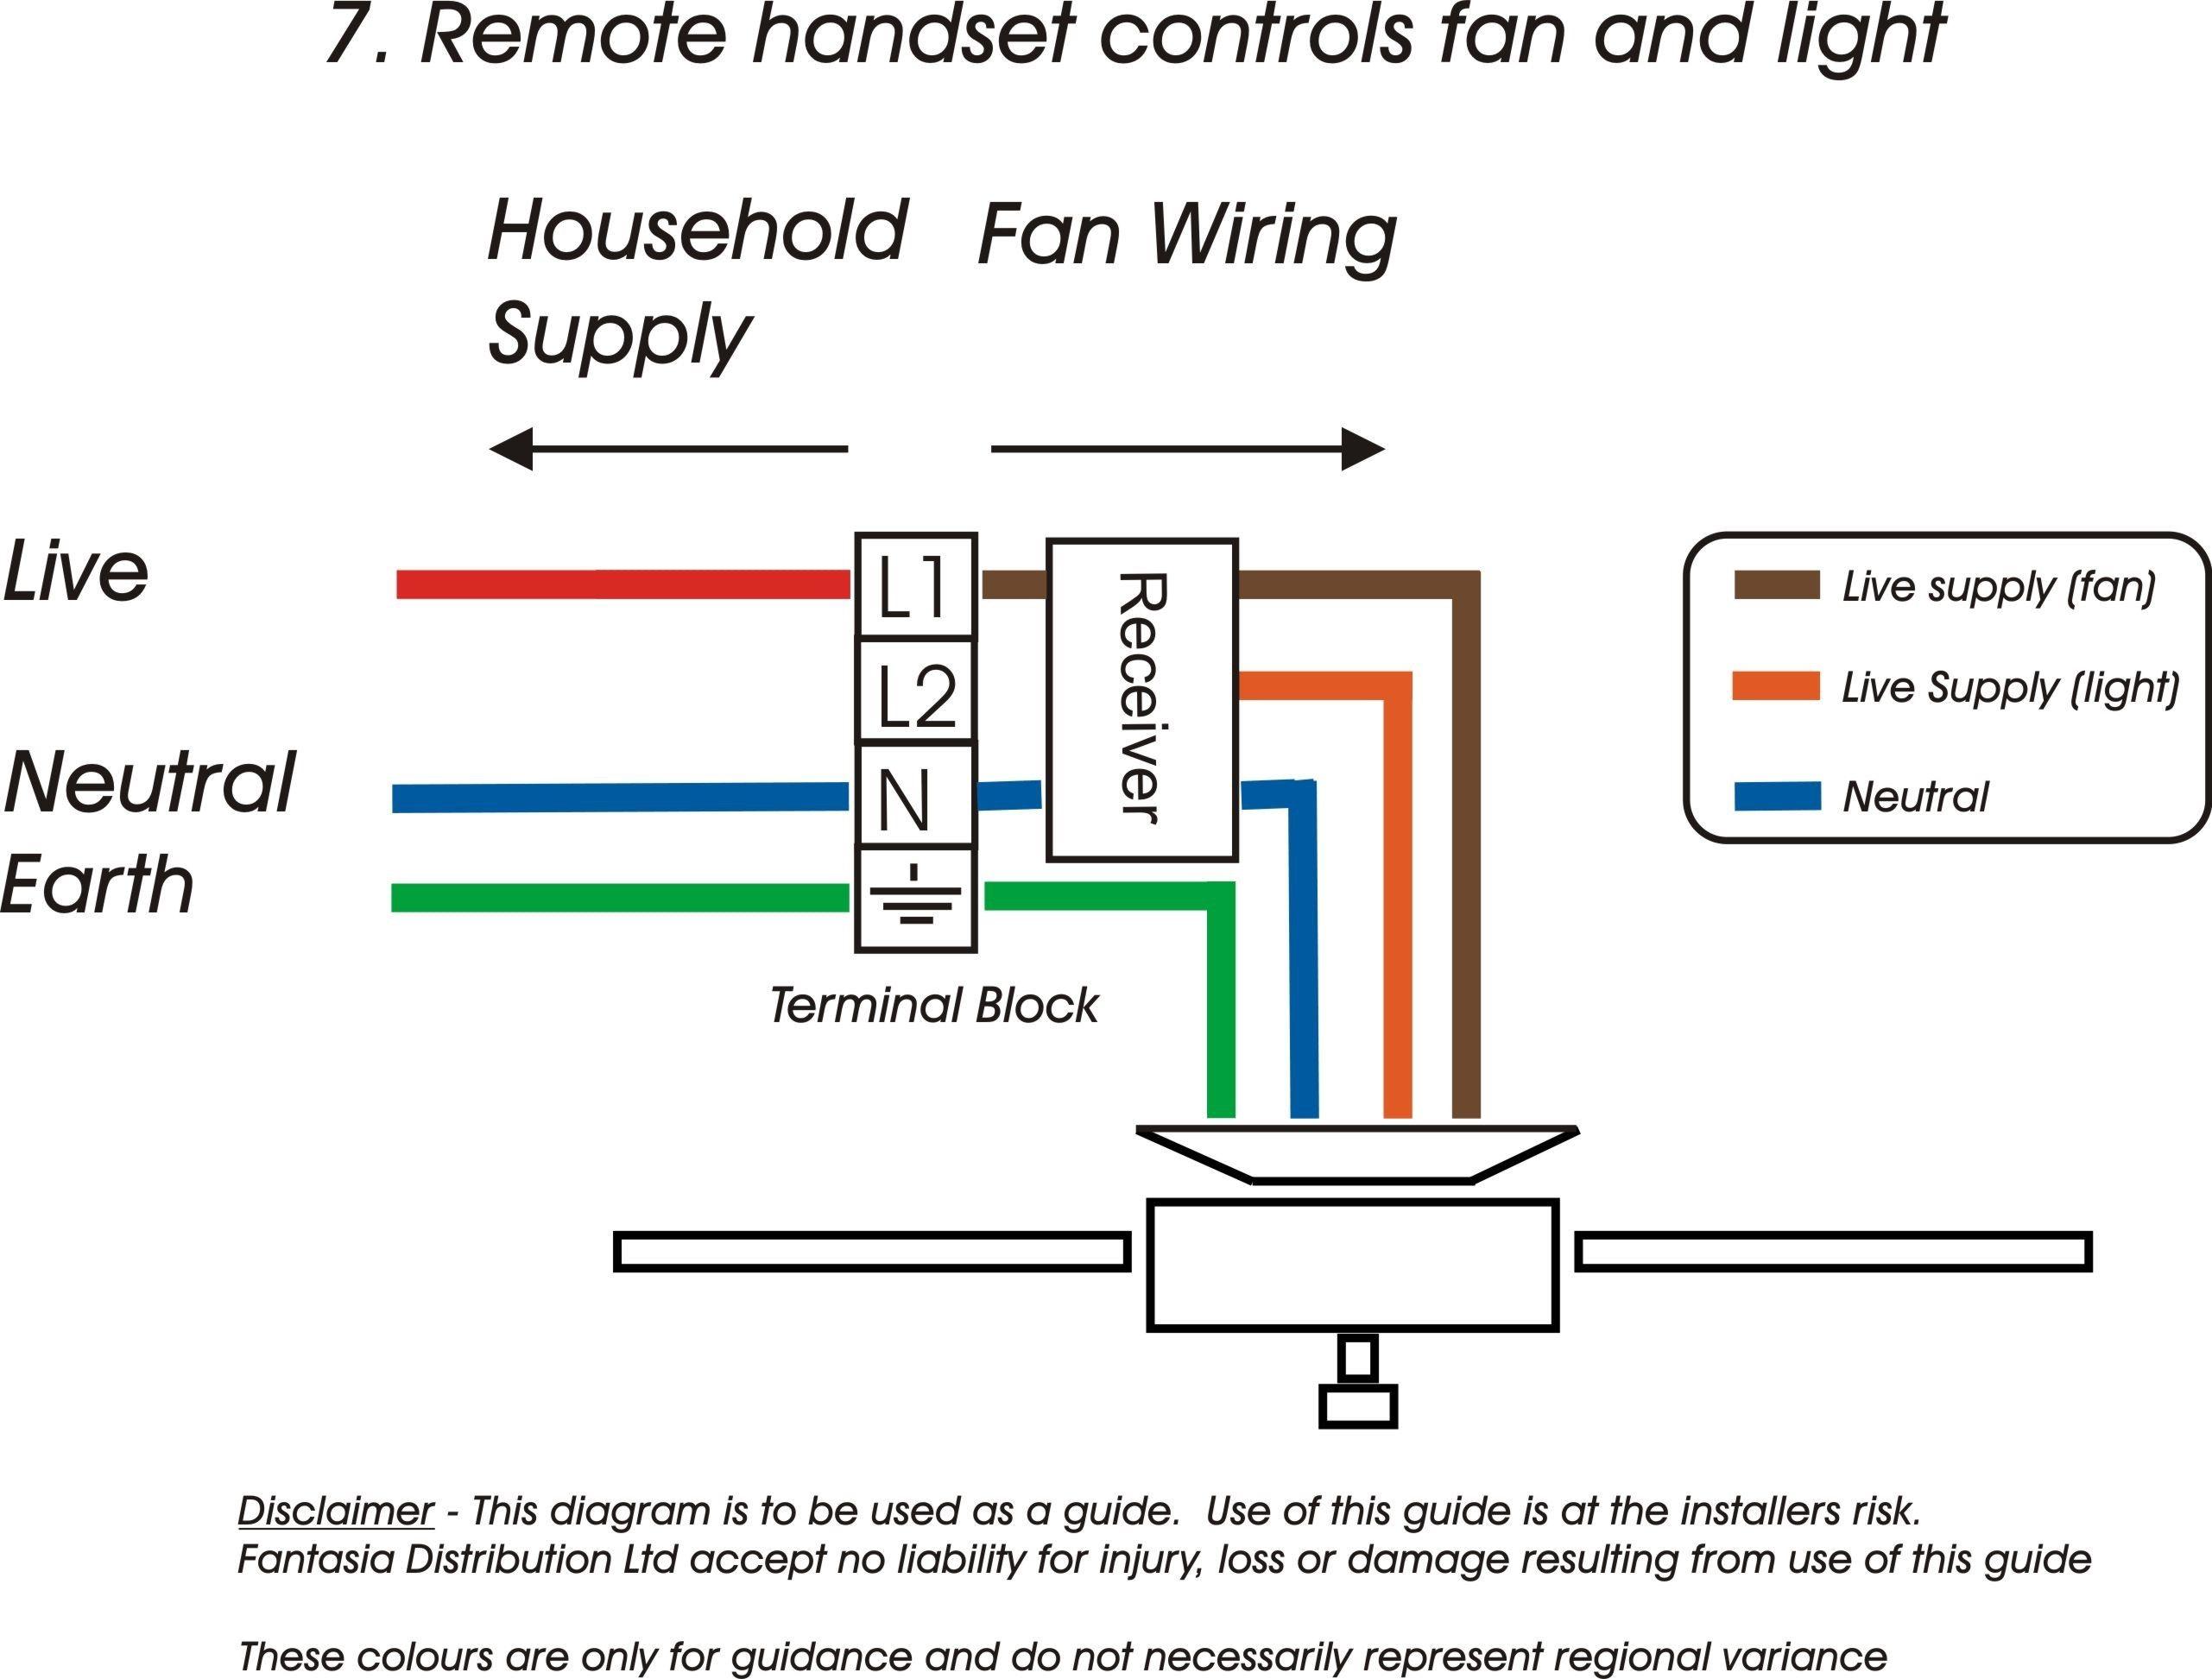 Bathroom fan light combo wiring httponlinecompliancefo bathroom fan light combo wiring asfbconference2016 Choice Image